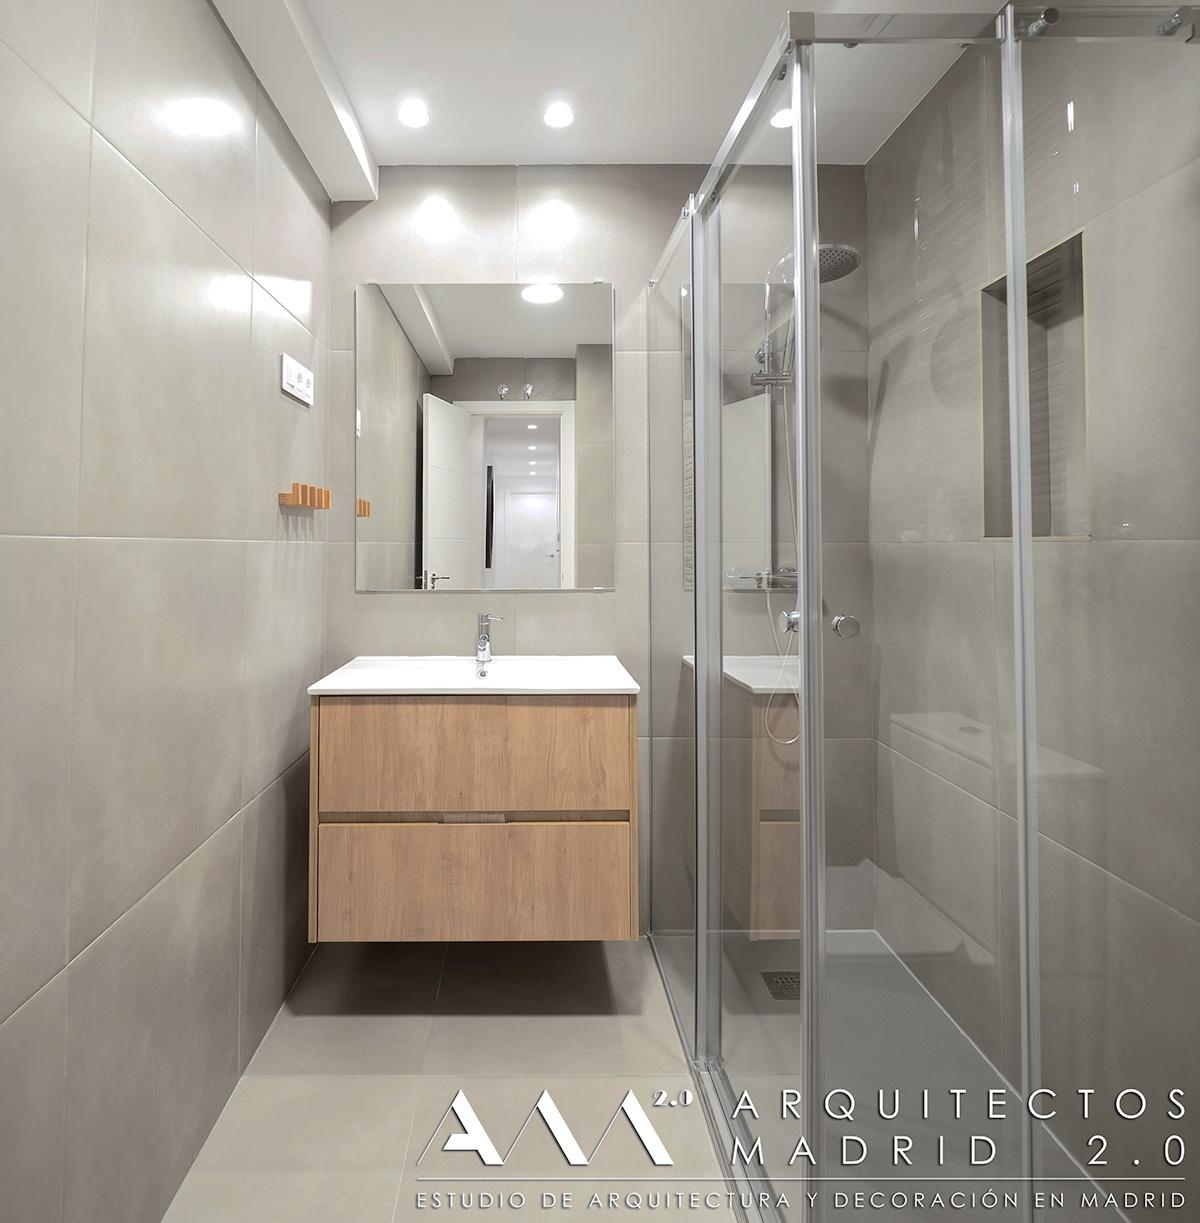 ideas-decoracion-reforma-pisos-pequenos-apartamentos-viviendas-18